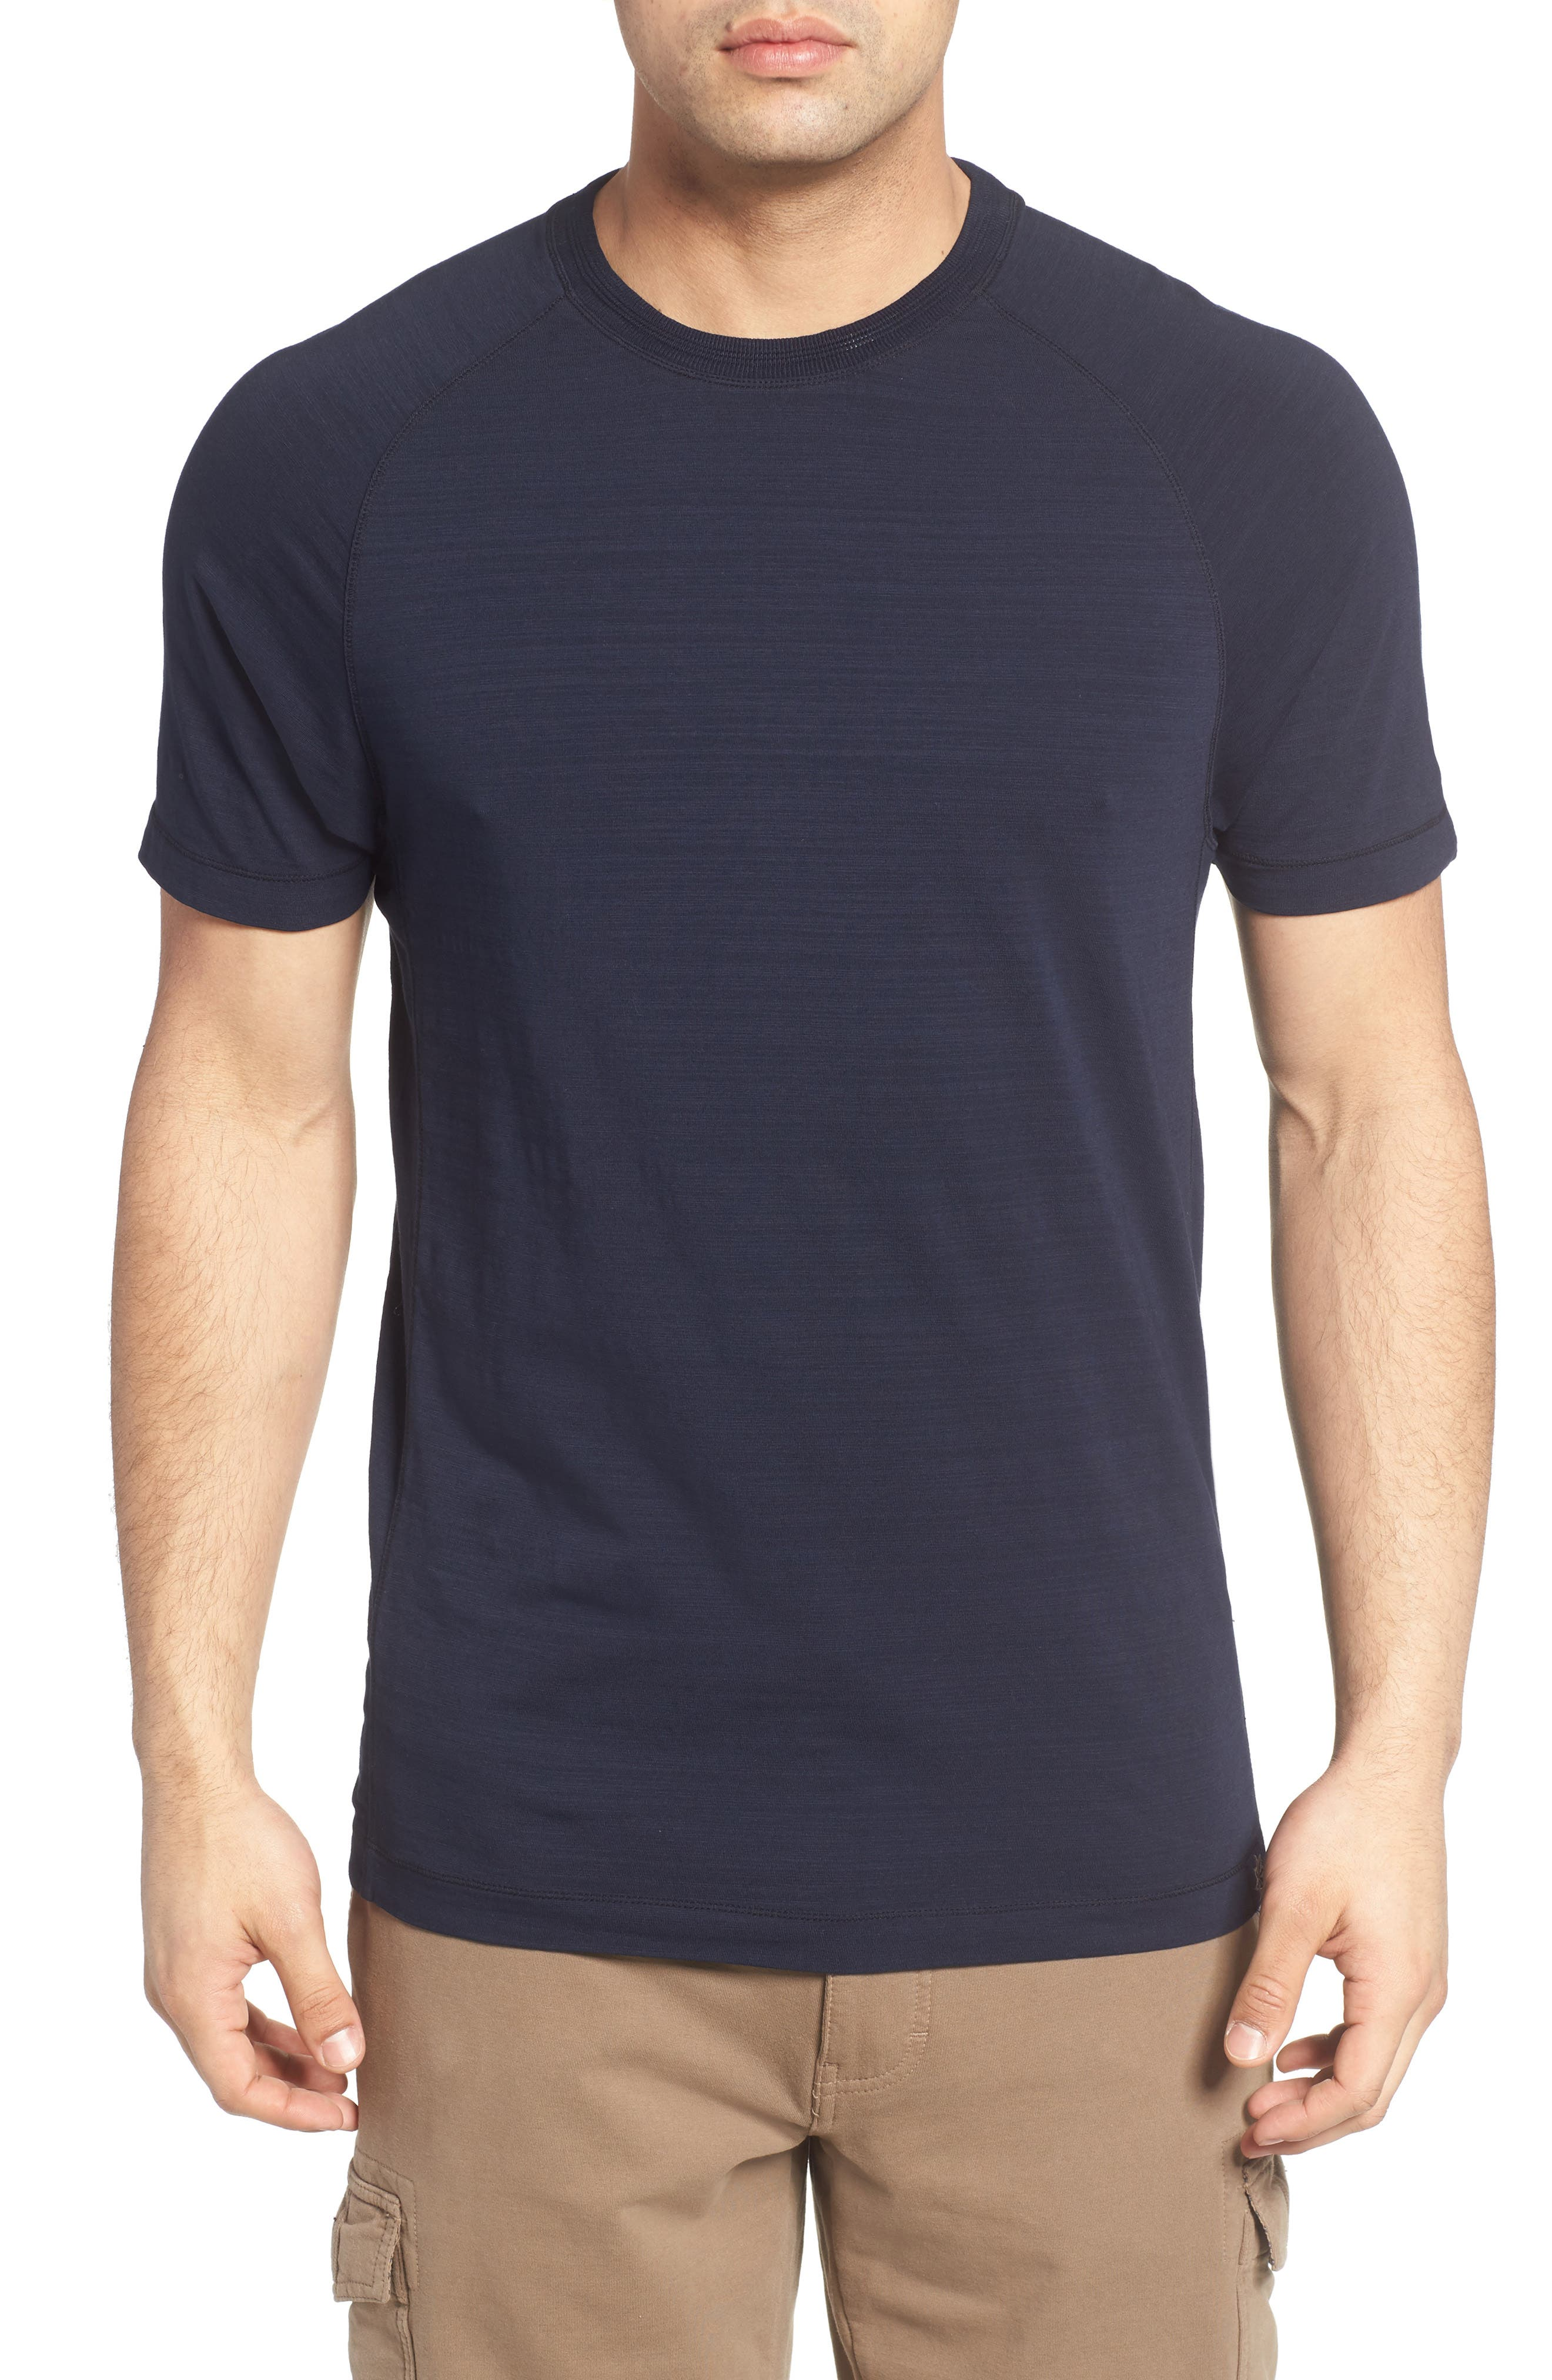 Main Image - Thaddeus Riggs Stretch Slub Jersey T-Shirt